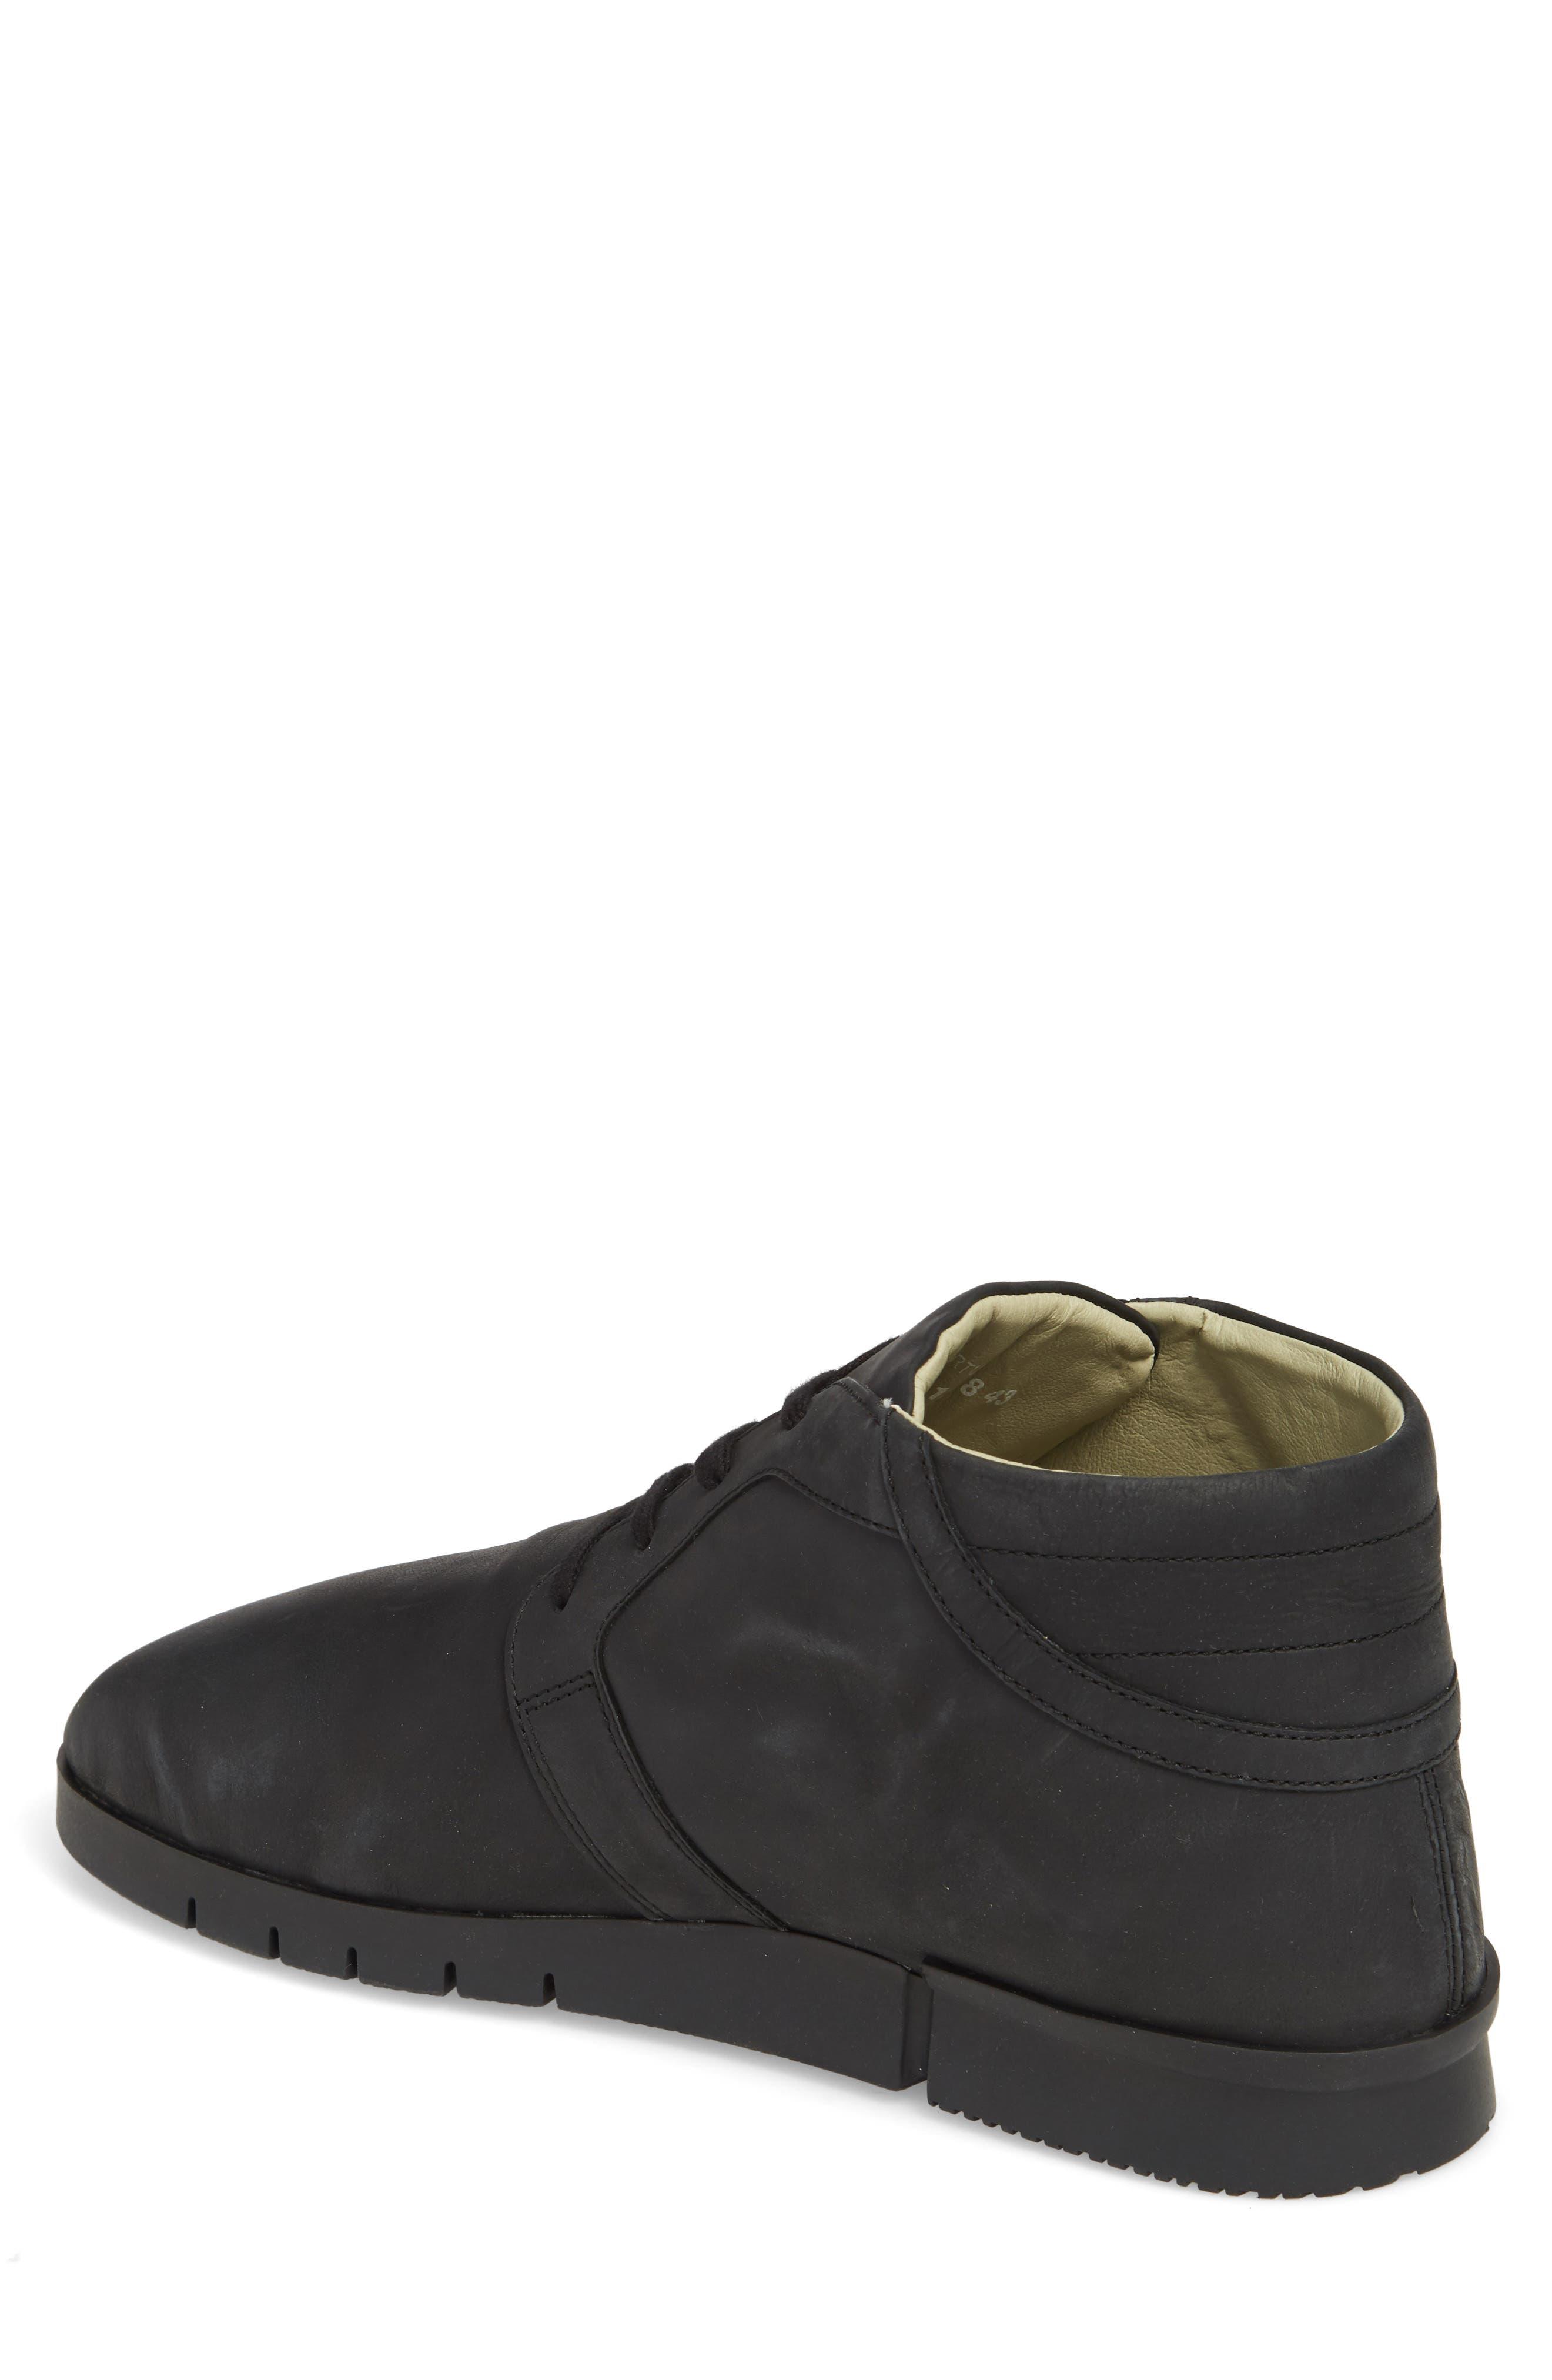 Cul Boot,                             Alternate thumbnail 2, color,                             Black Corgi Leather